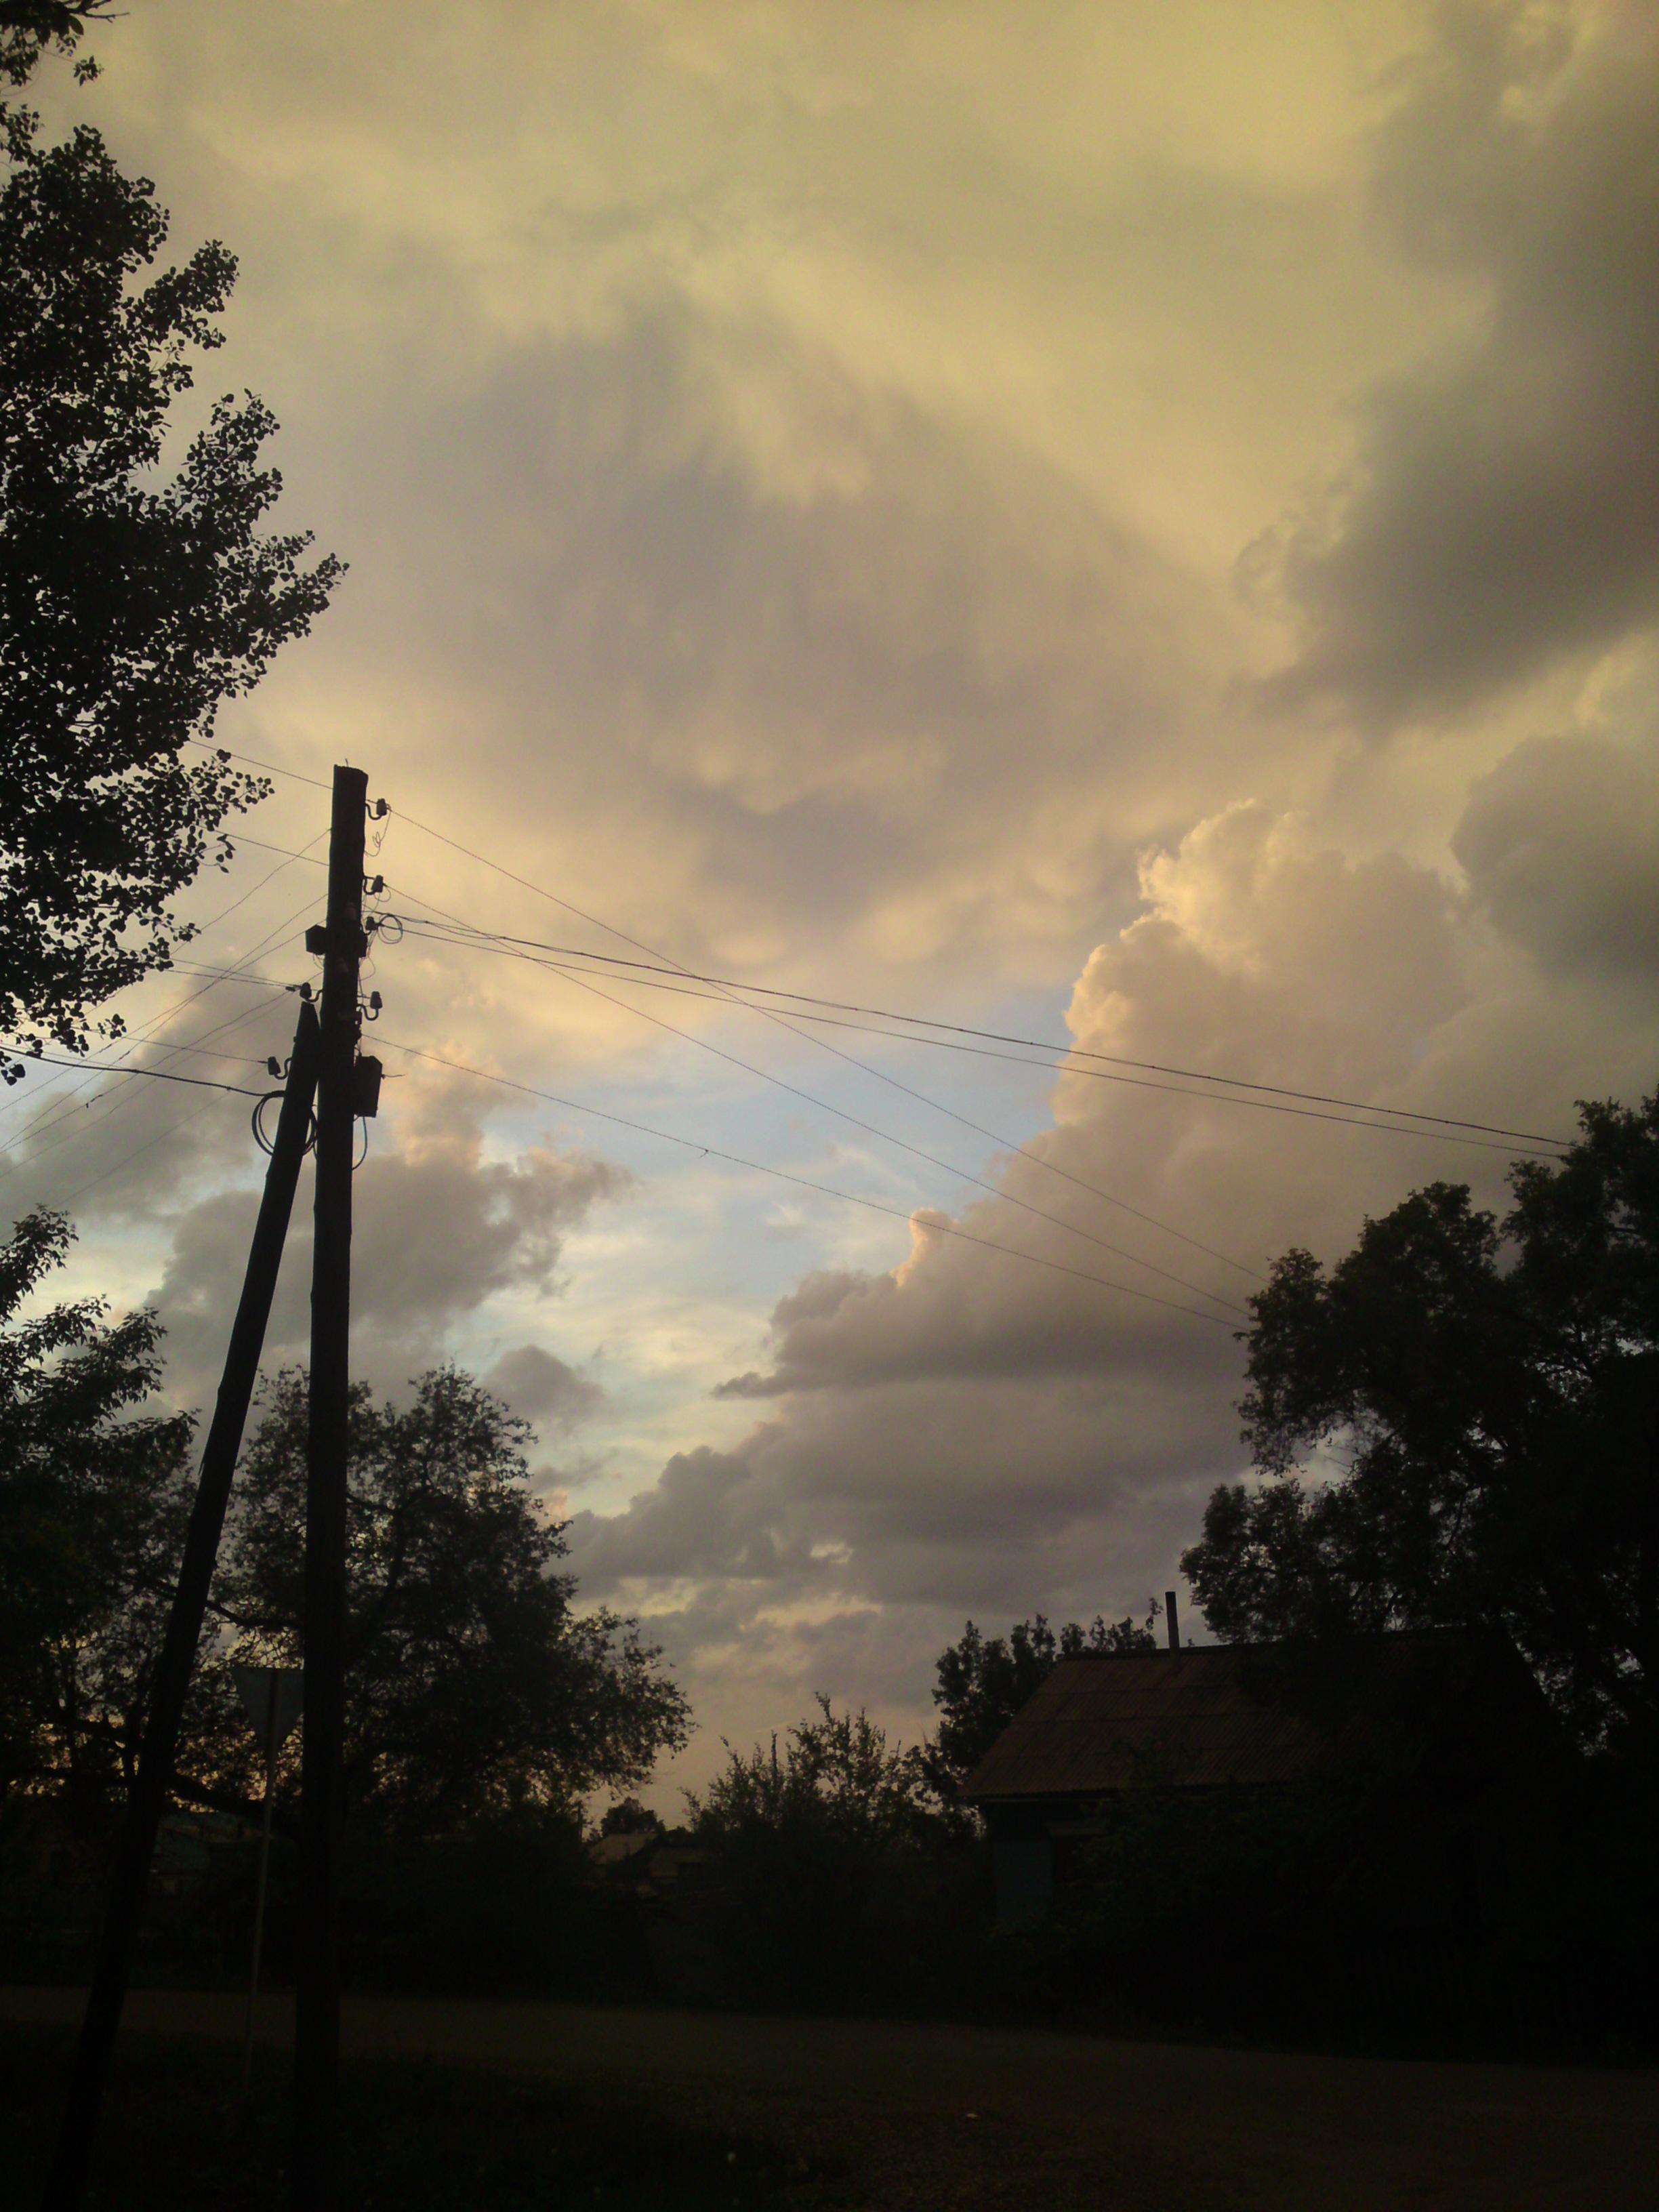 Storm sky photo